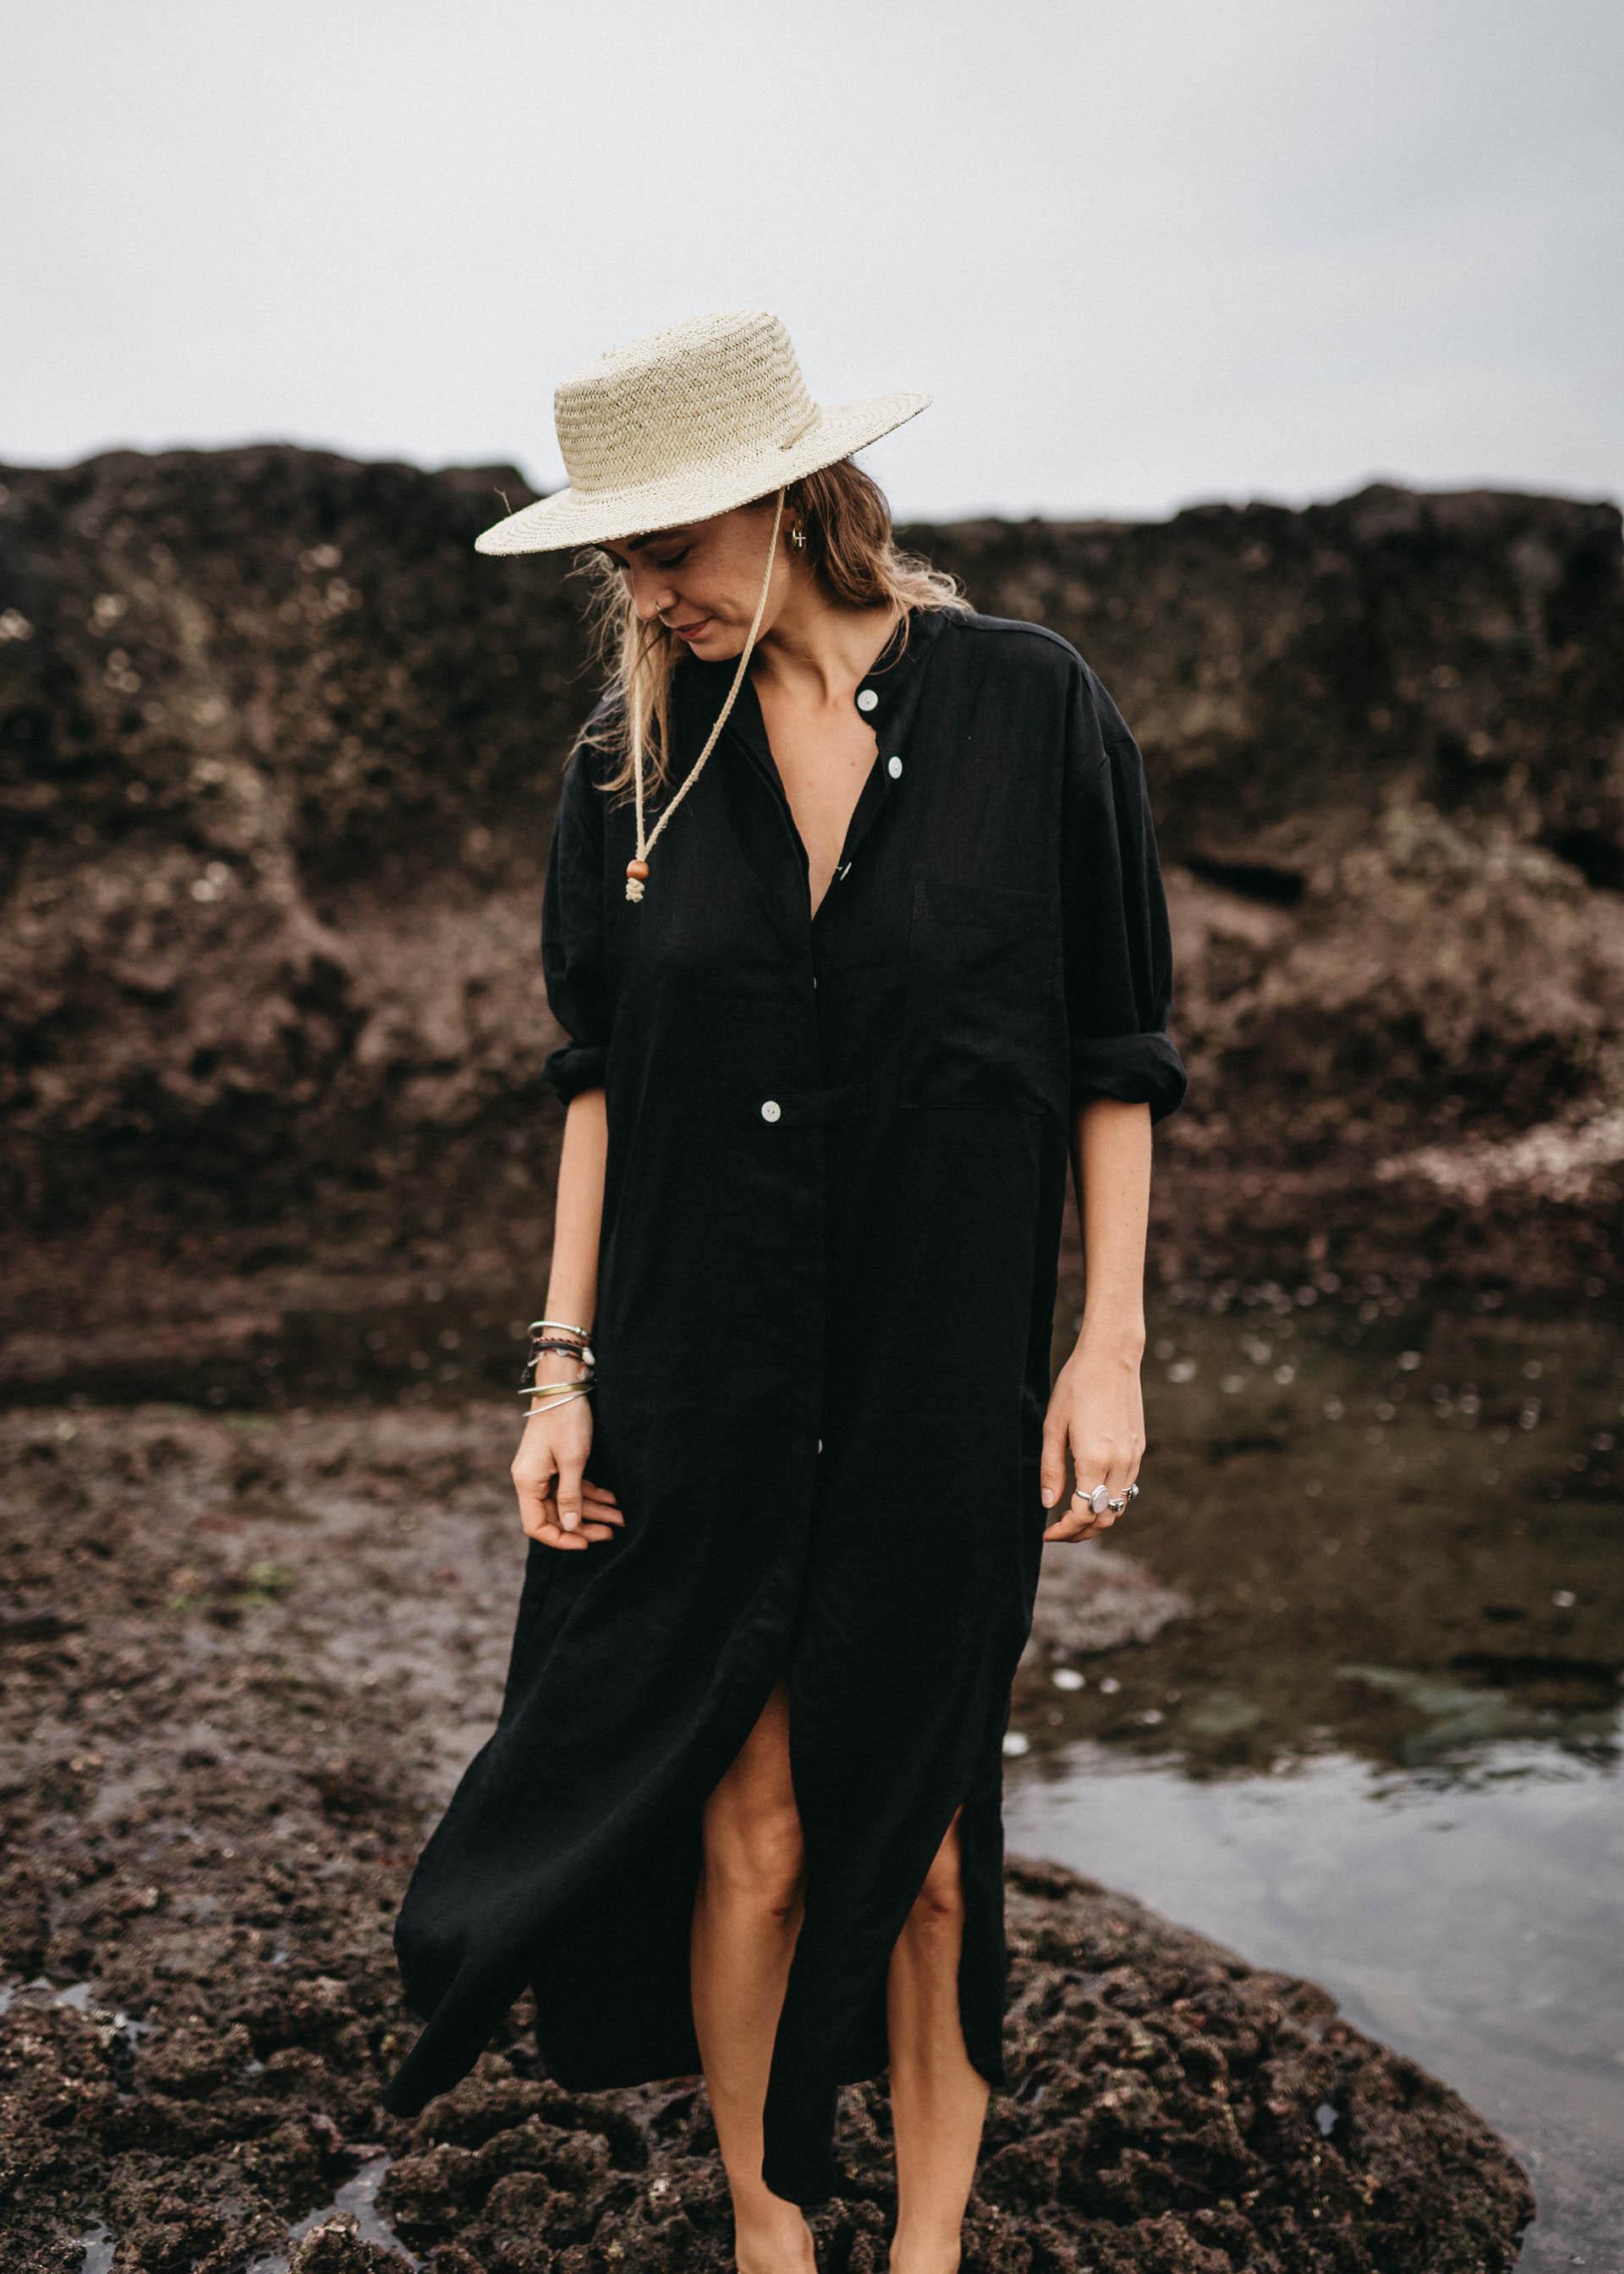 keira-mason-studio-karma-beach-black-dress-straw-hat-.jpg